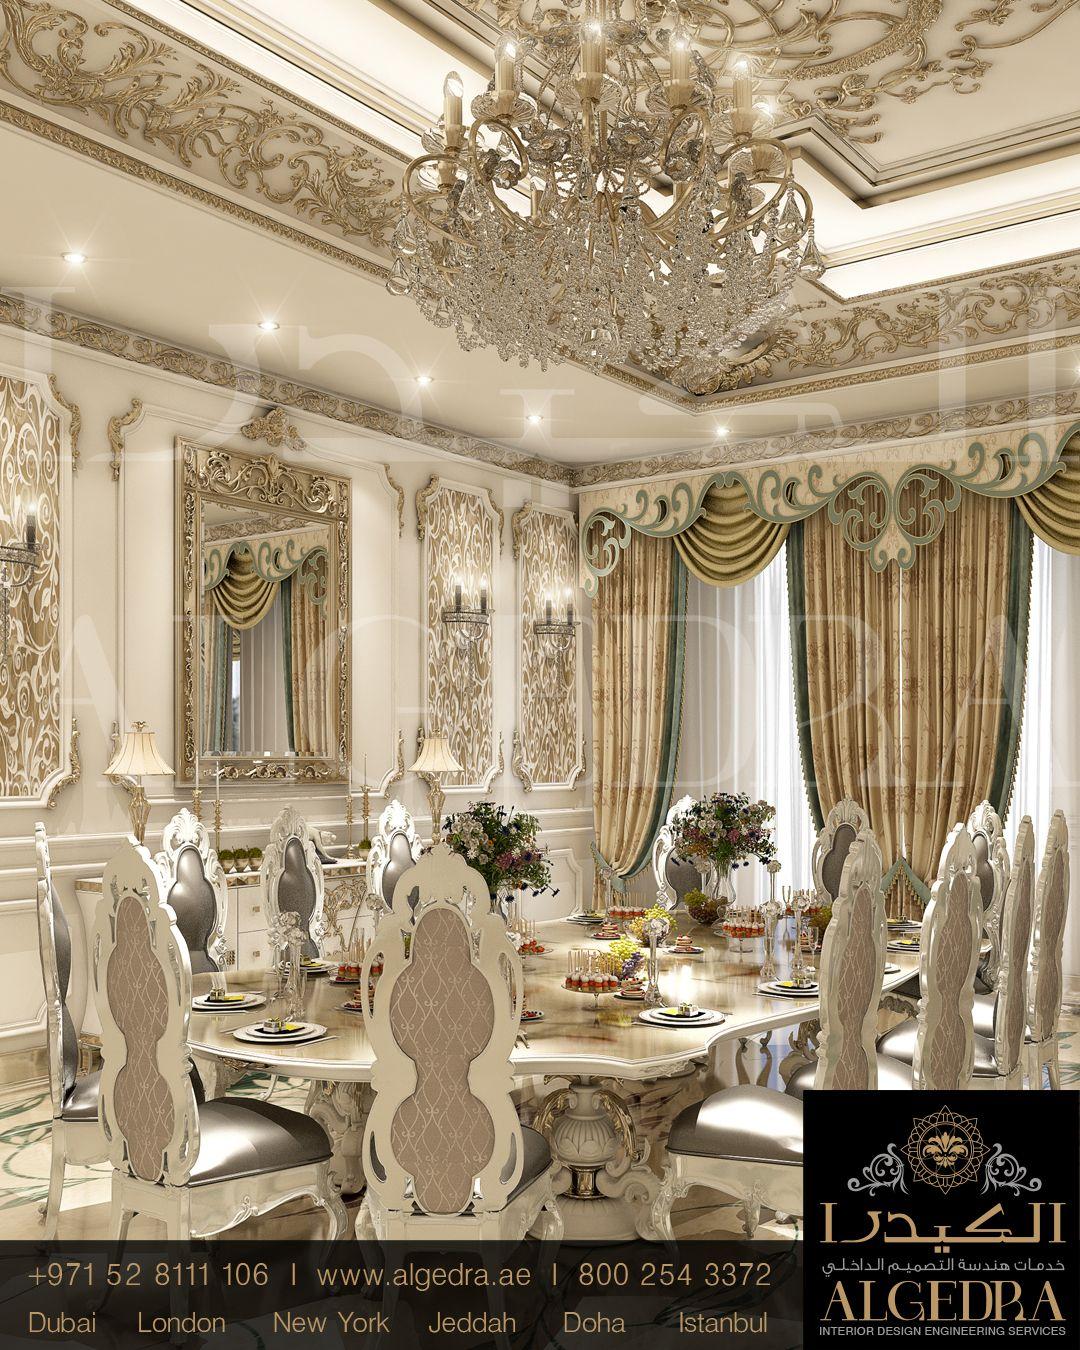 126 Custom Luxury Dining Room Interior Designs: Pin By Algedra Interior Design On Algedra Interior Design